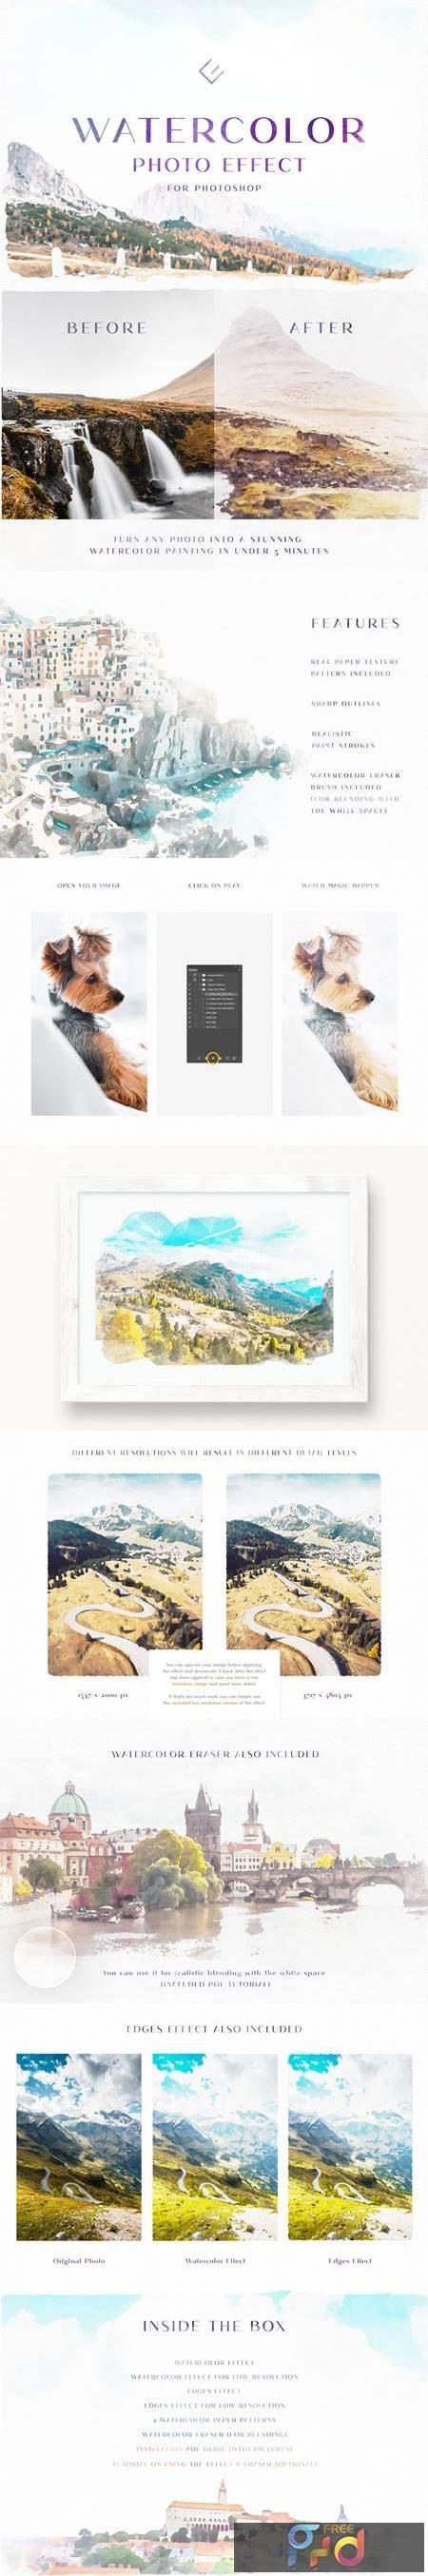 Watercolor Photo Effect 4970039 1